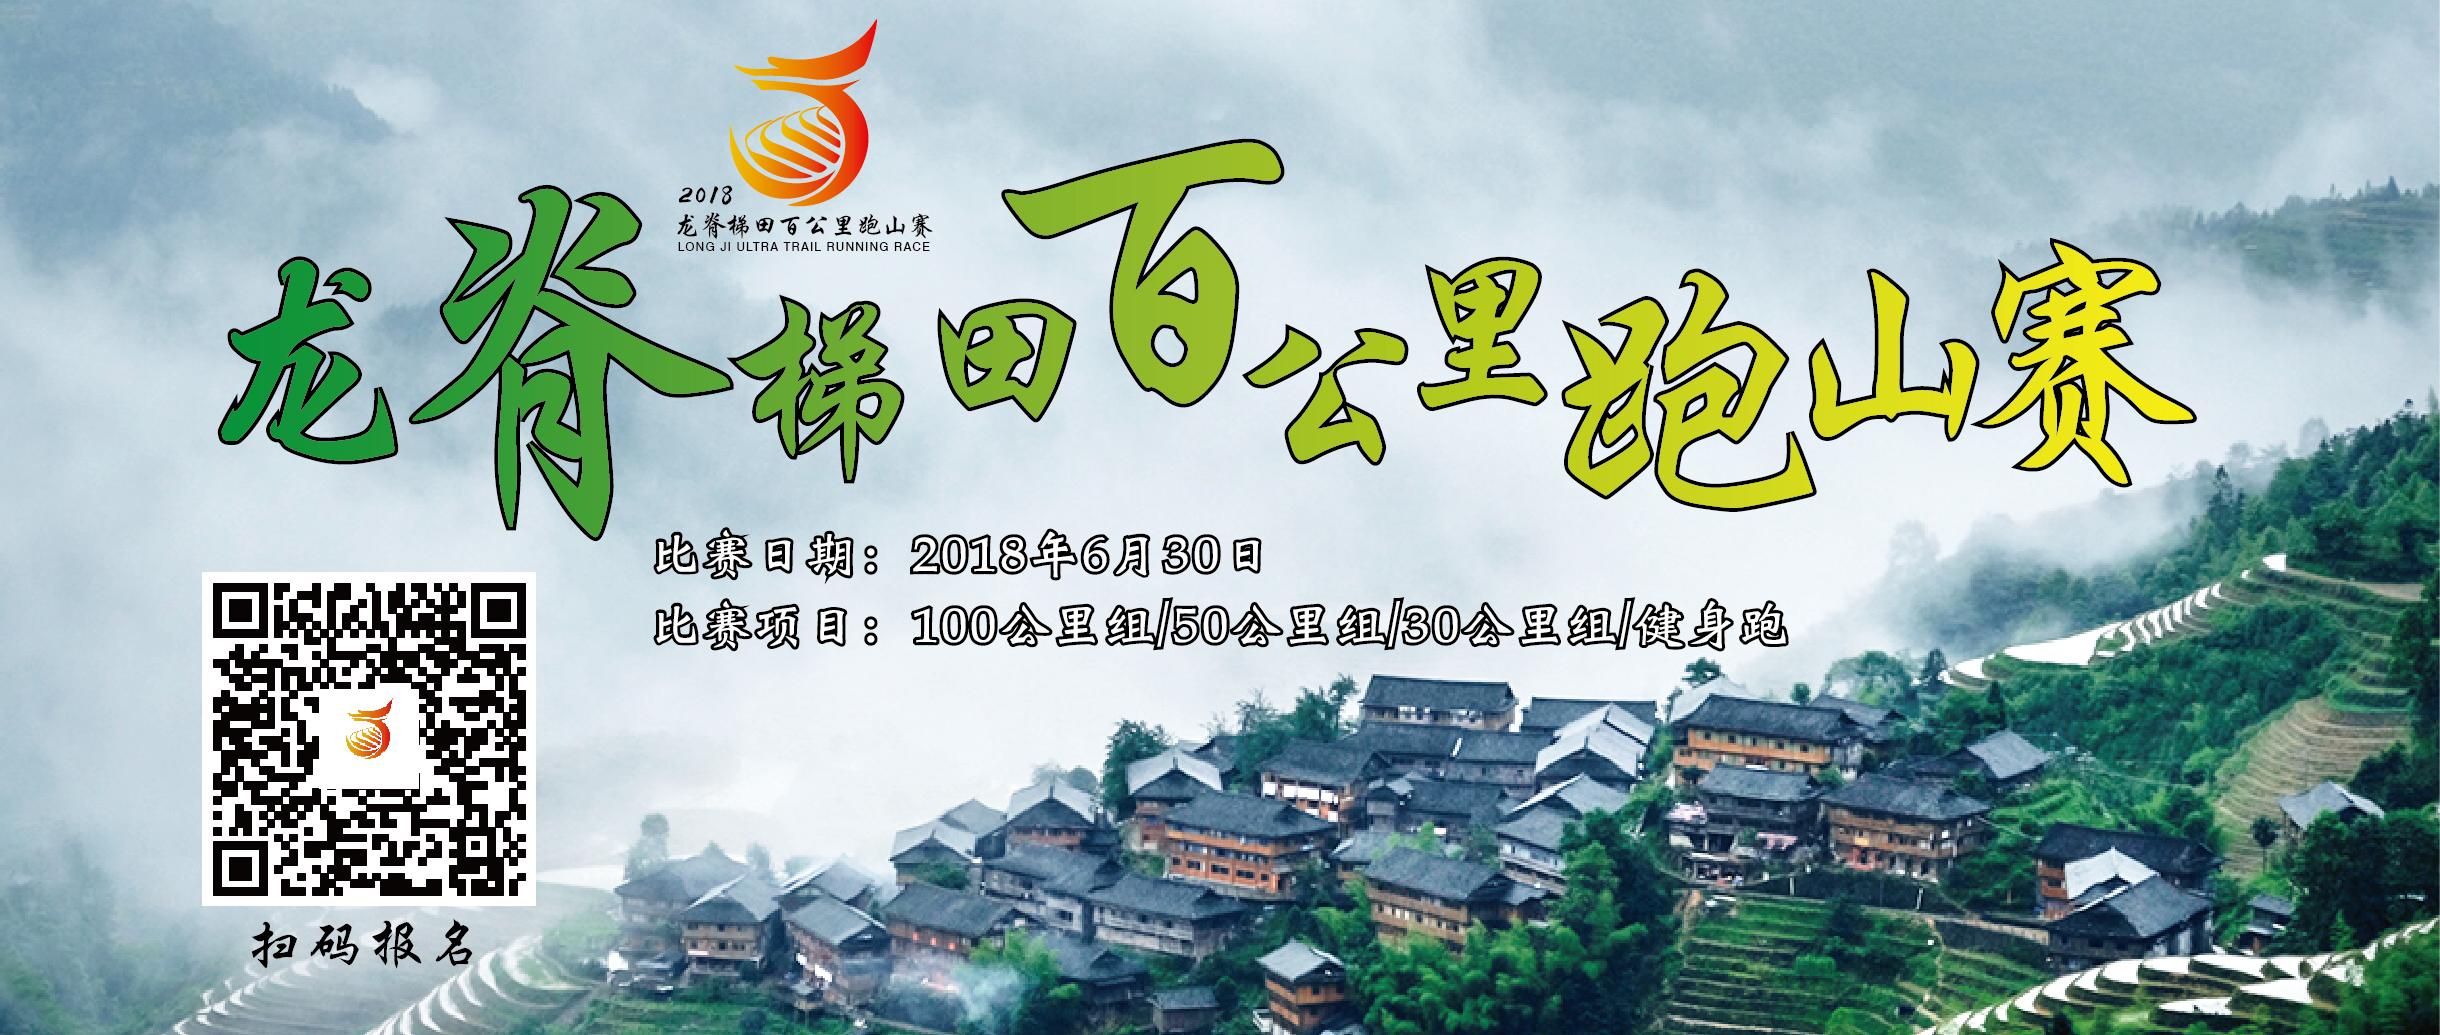 http://img.sport-china.cn/180429125ae5457ee8c54.jpeg